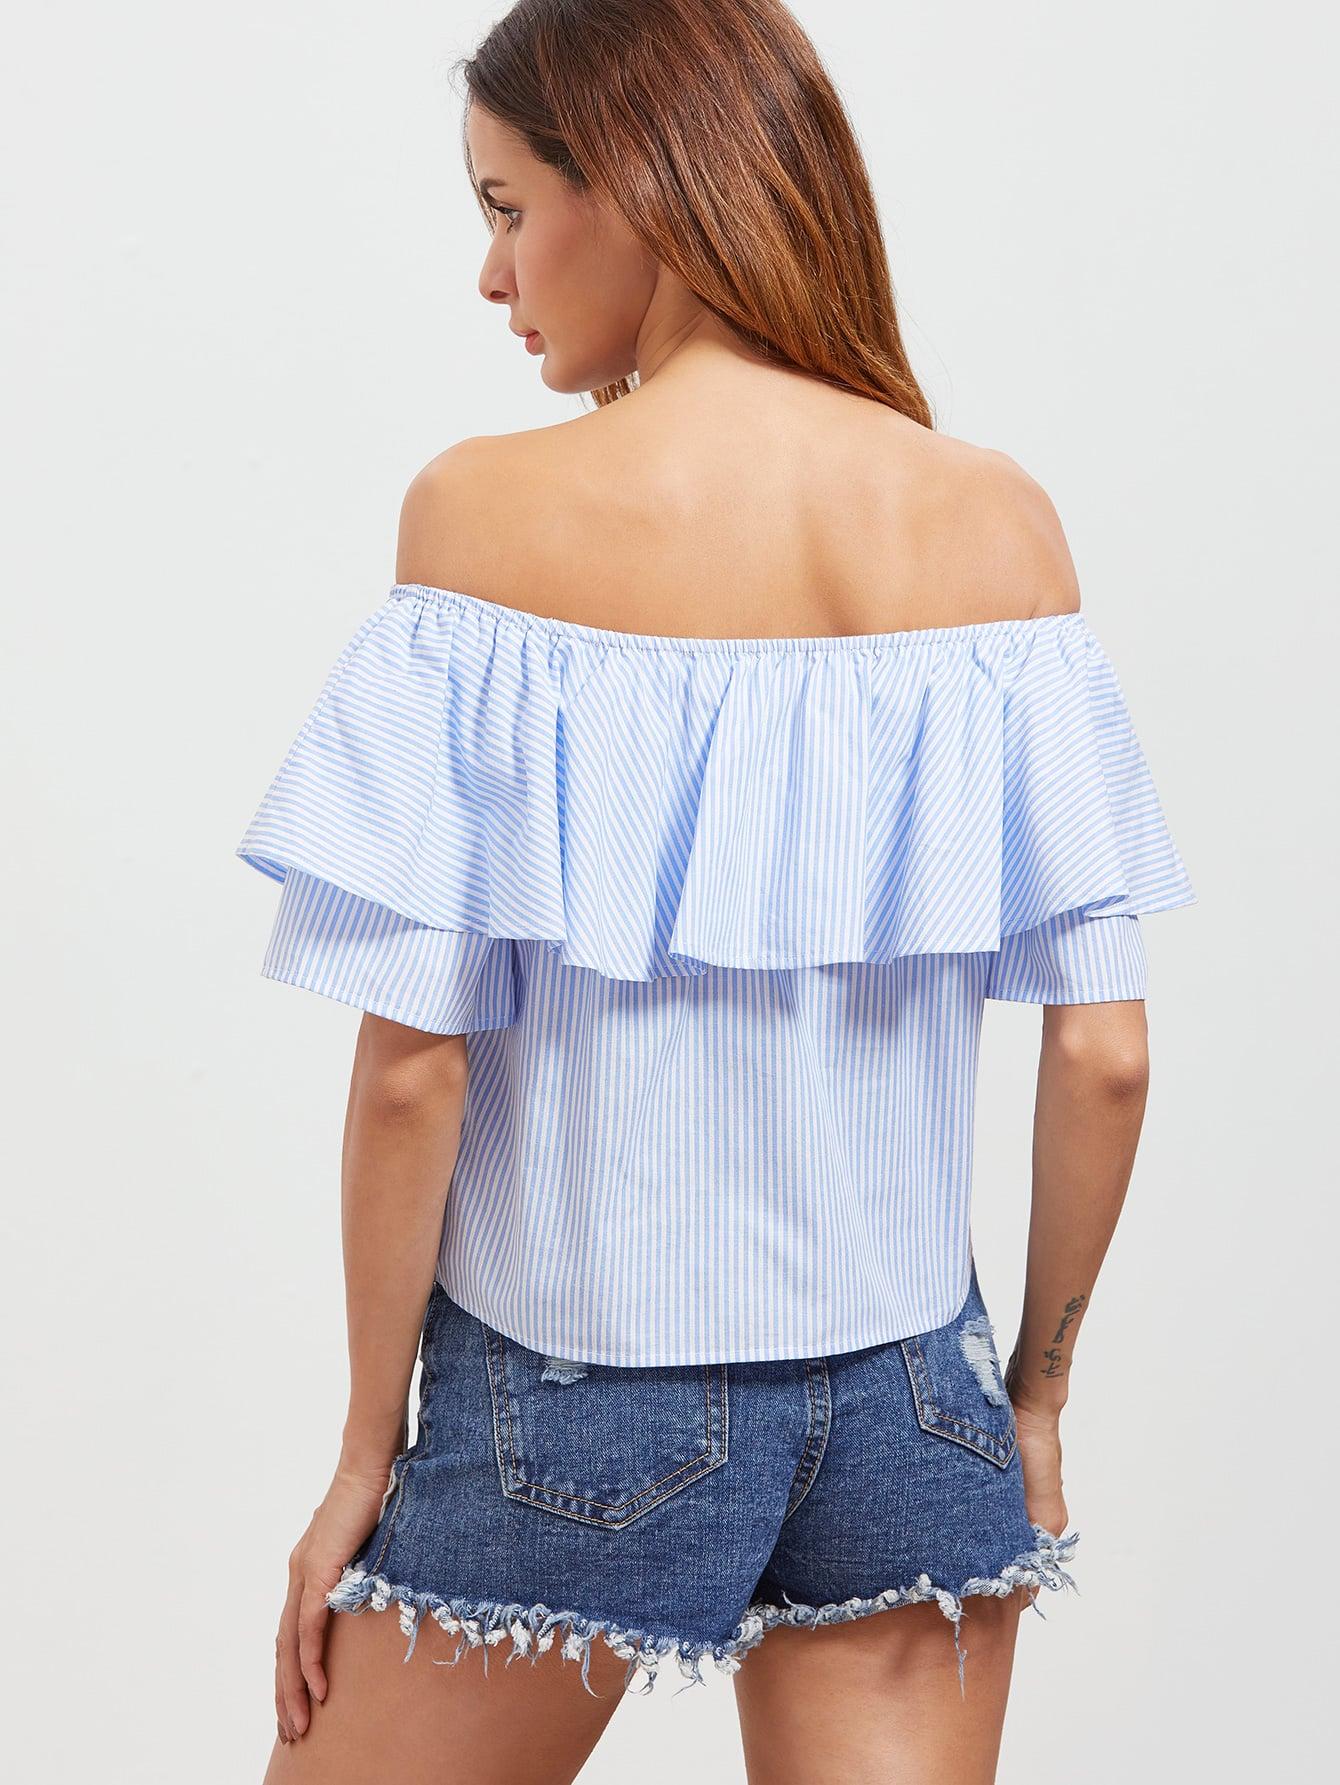 blouse161228703_2